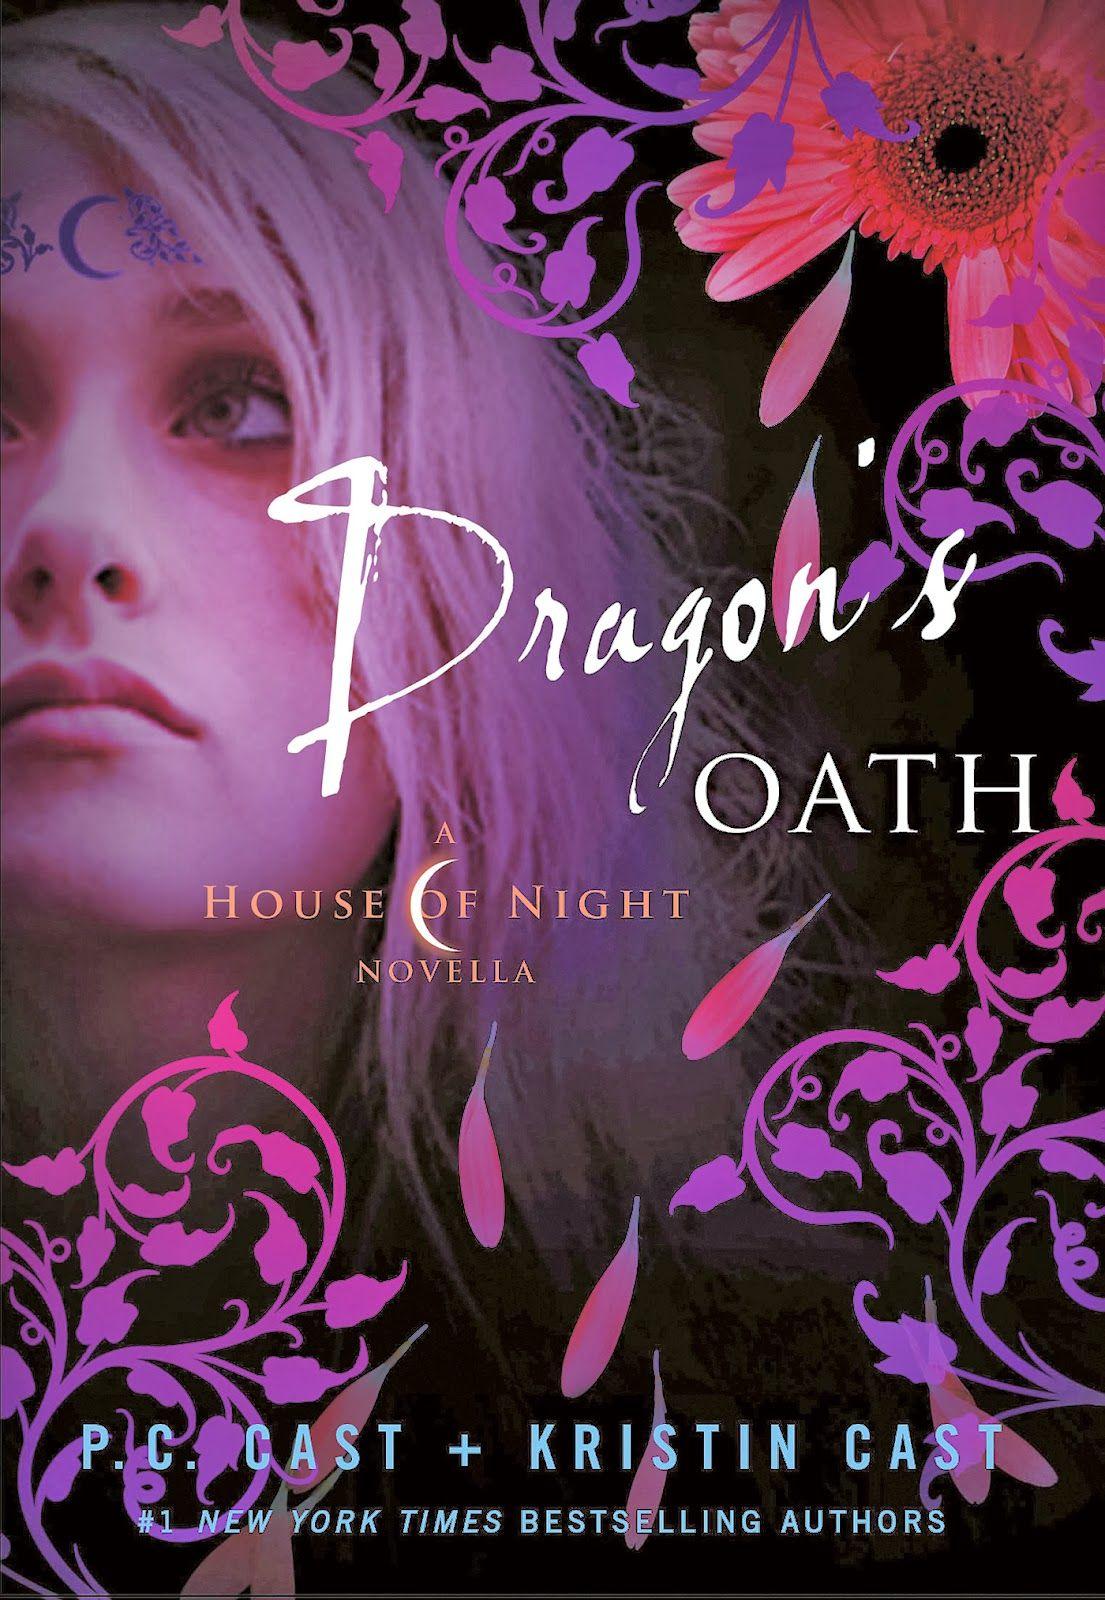 Dragon's Oath (a House Of Night Novella) By Pc Cast & Kristen Cast